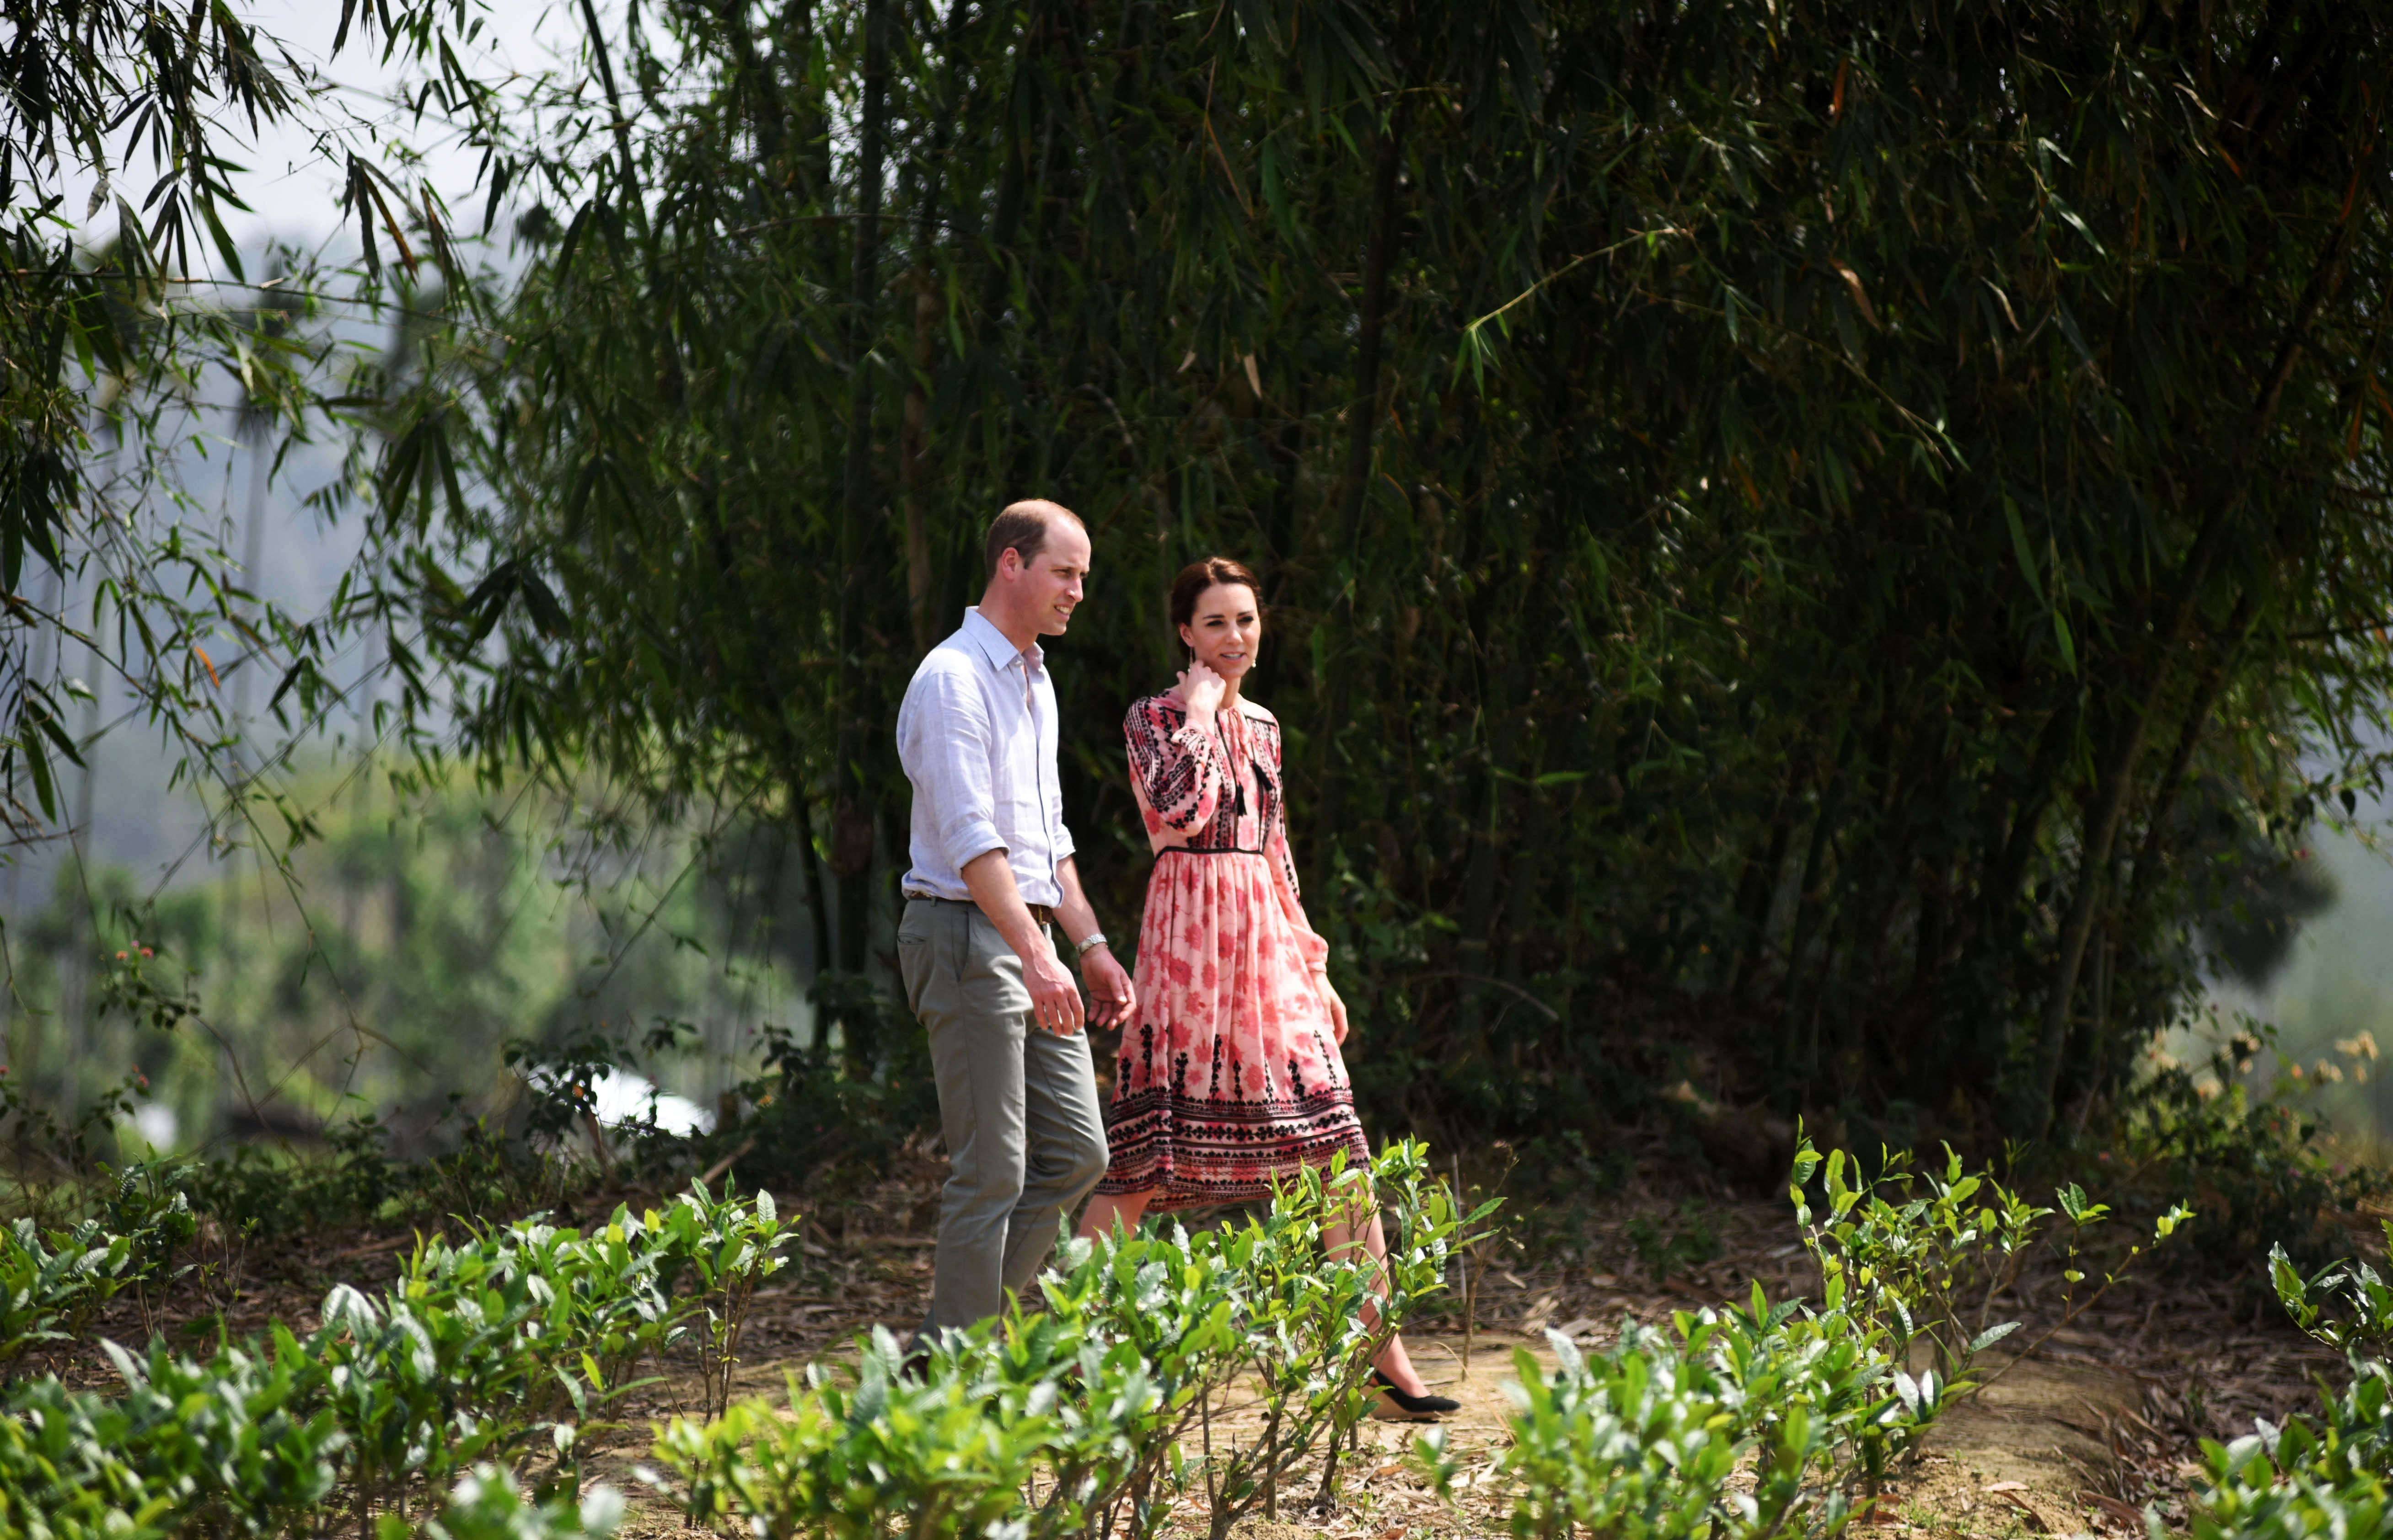 Britain's Prince William, Duke of Cambridge and Catherine, Duchess of Cambridge visit a village tea garden in Kaziranga, India's Assam State, on April 13. (BIJU BORO/AFP/Getty Images)